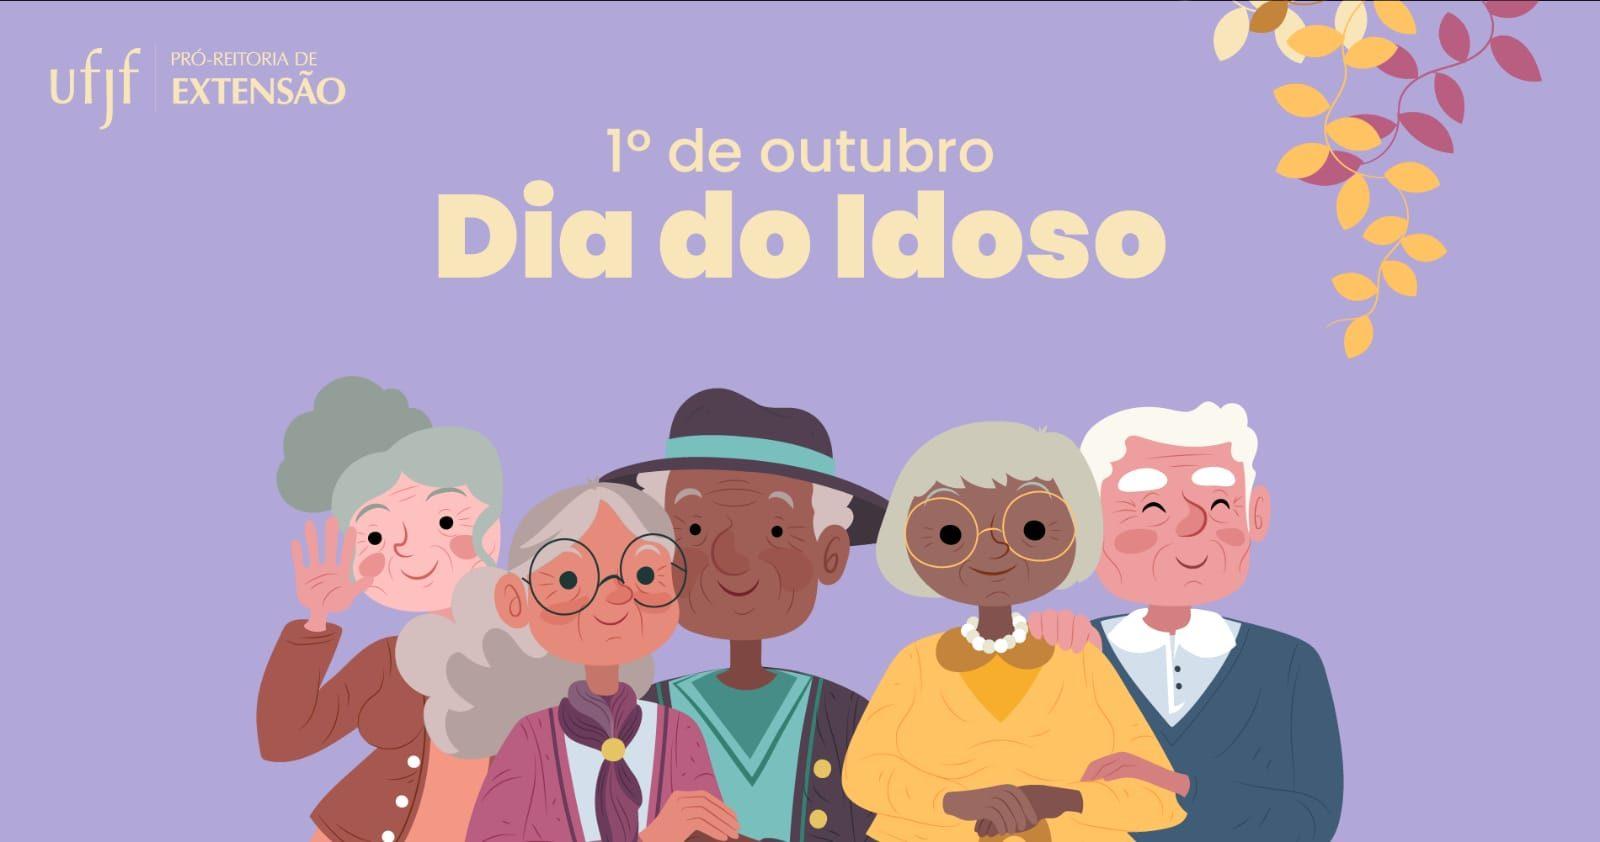 Dia do Idoso é celebrado nesta sexta, 1° de outubro